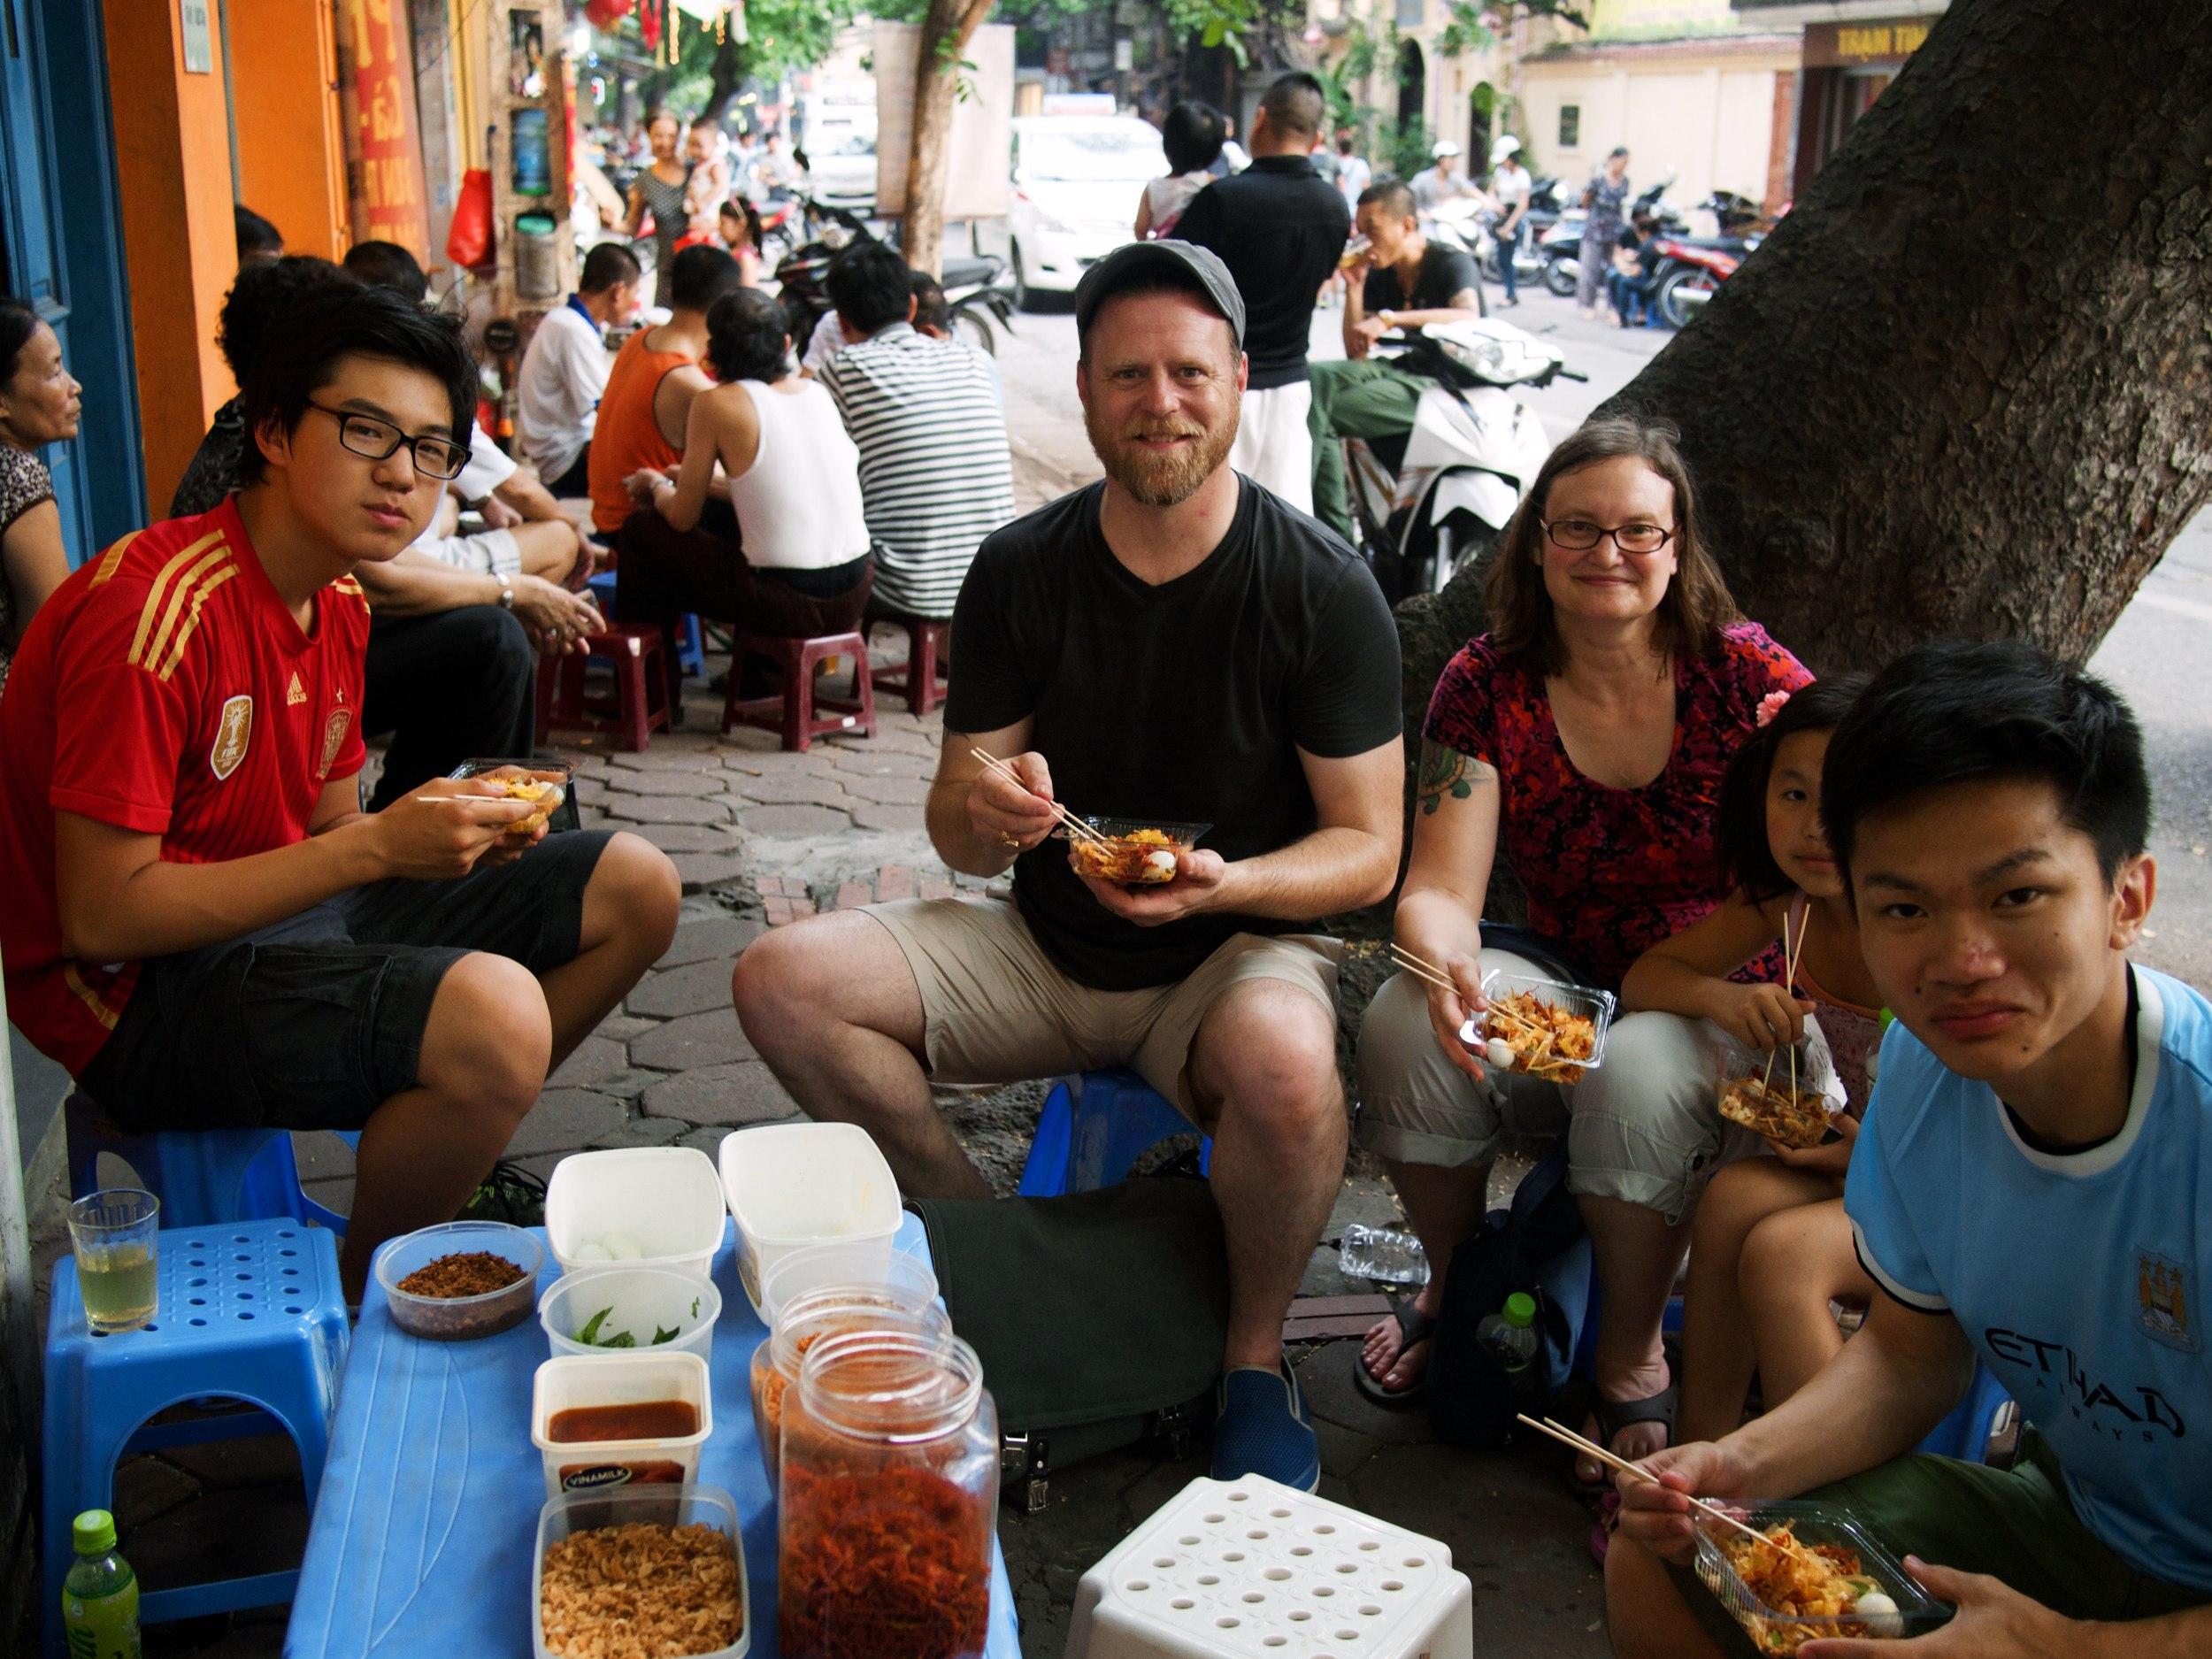 Pictured left to right: Pak, John, Kori, Xiu Dan and Chien McCollum in Hanoi, Vietnam